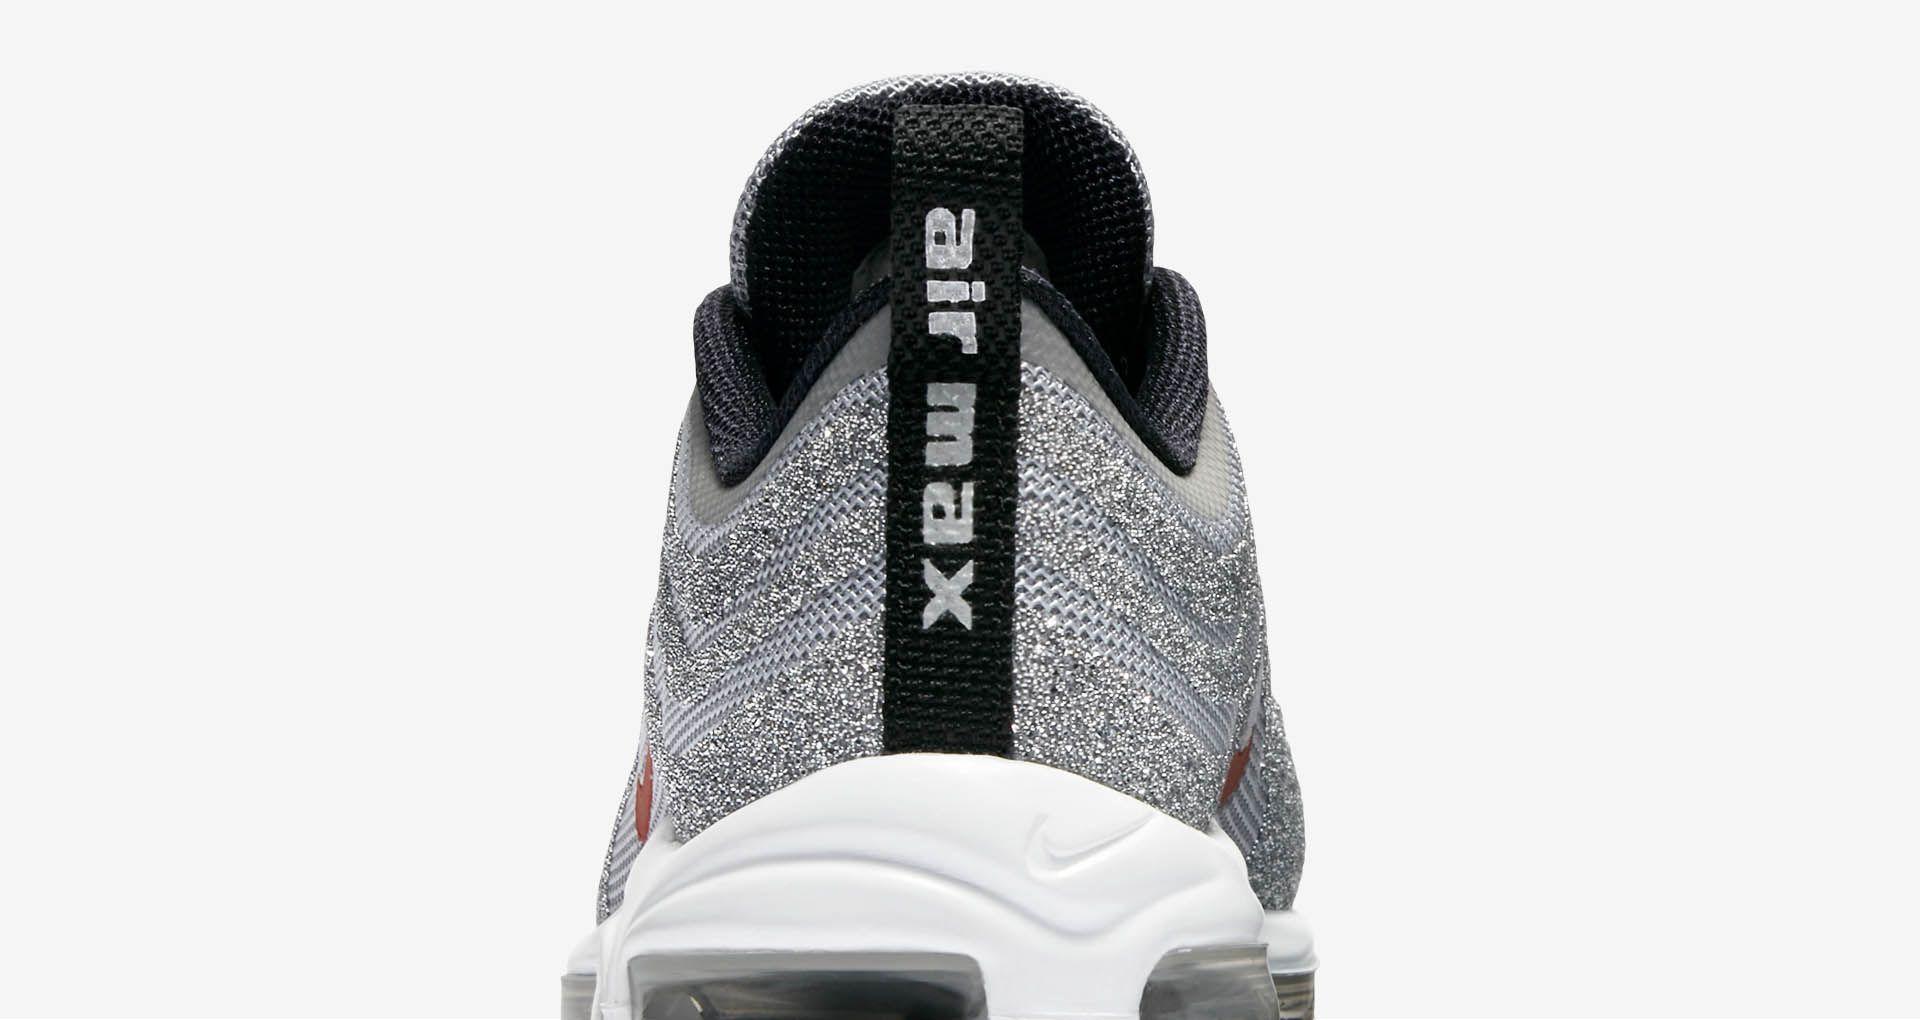 Women's Nike Air Max 97 'Swarovski' Release Date